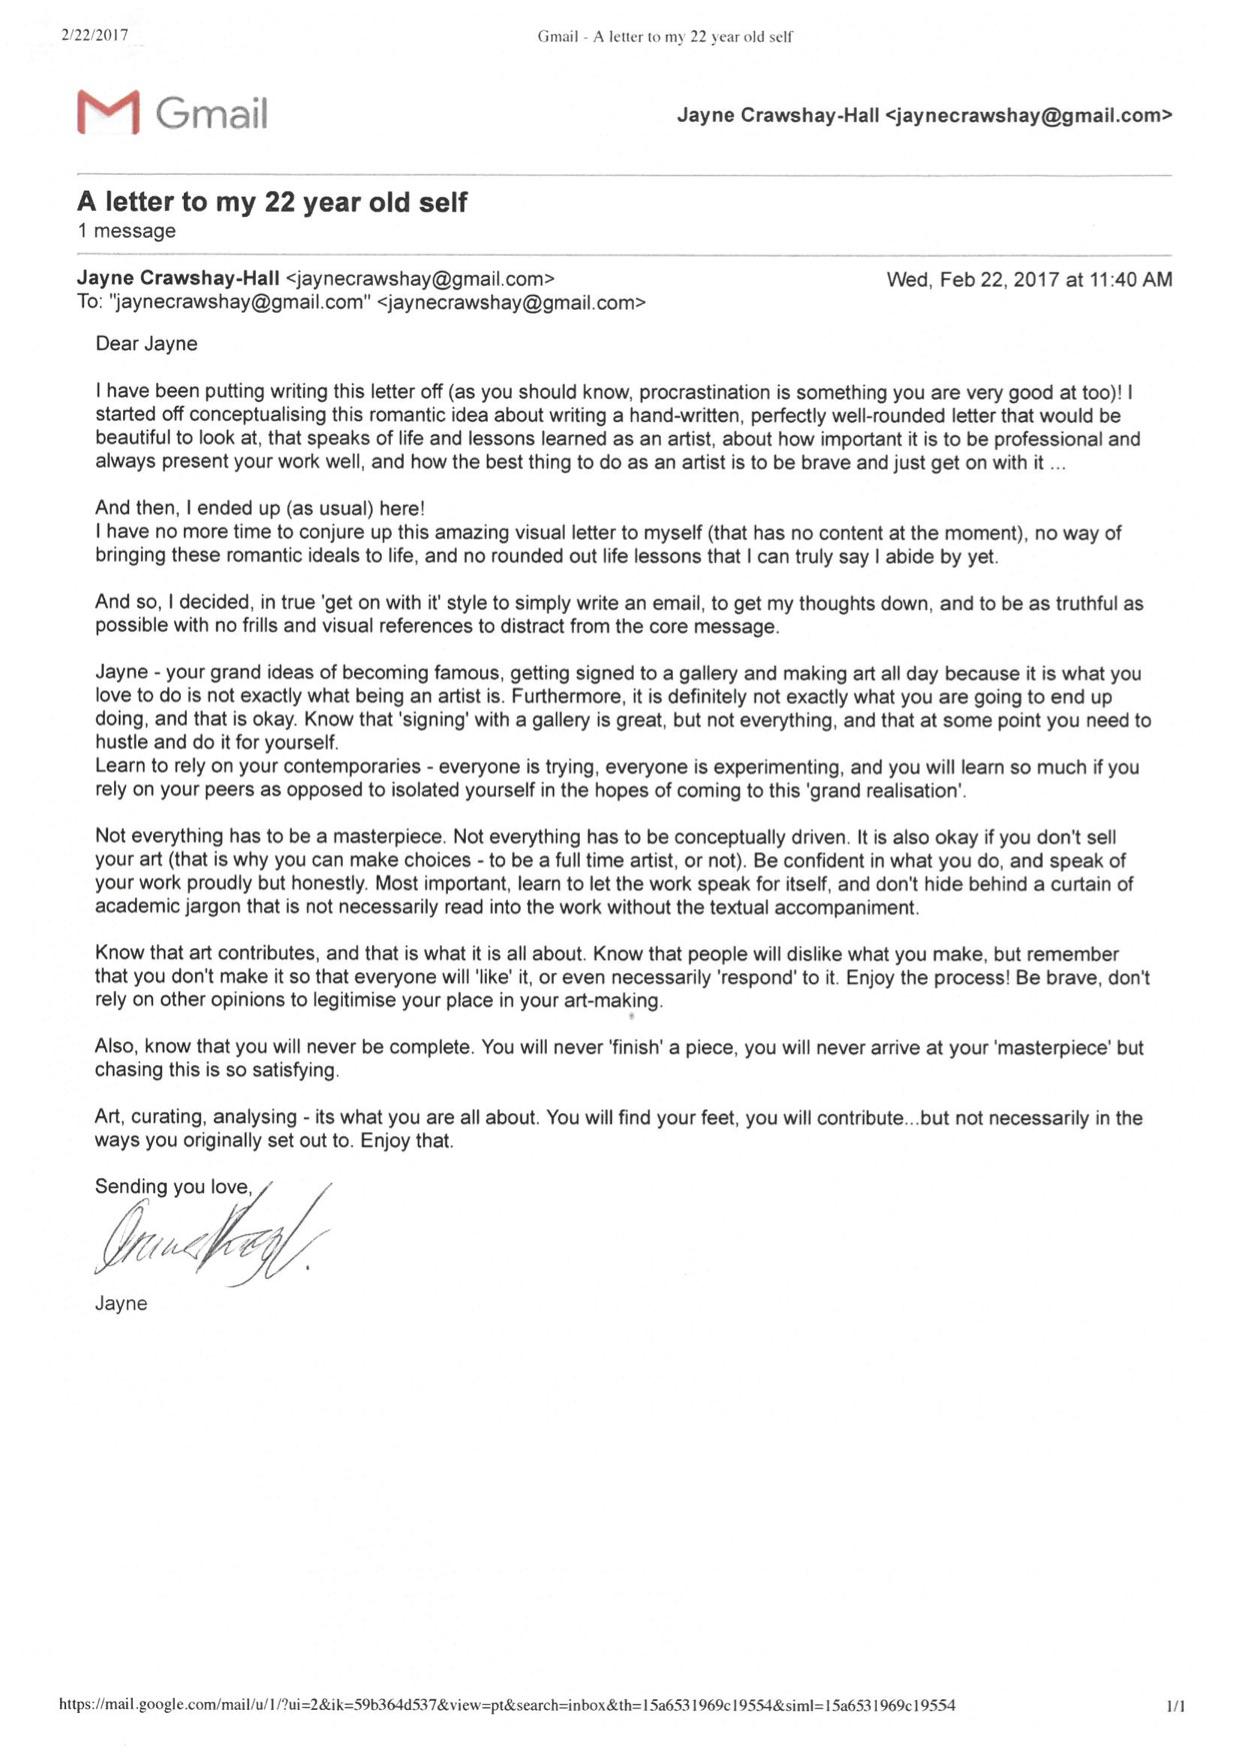 Jane Crawshay-Hall_s Letter .jpg